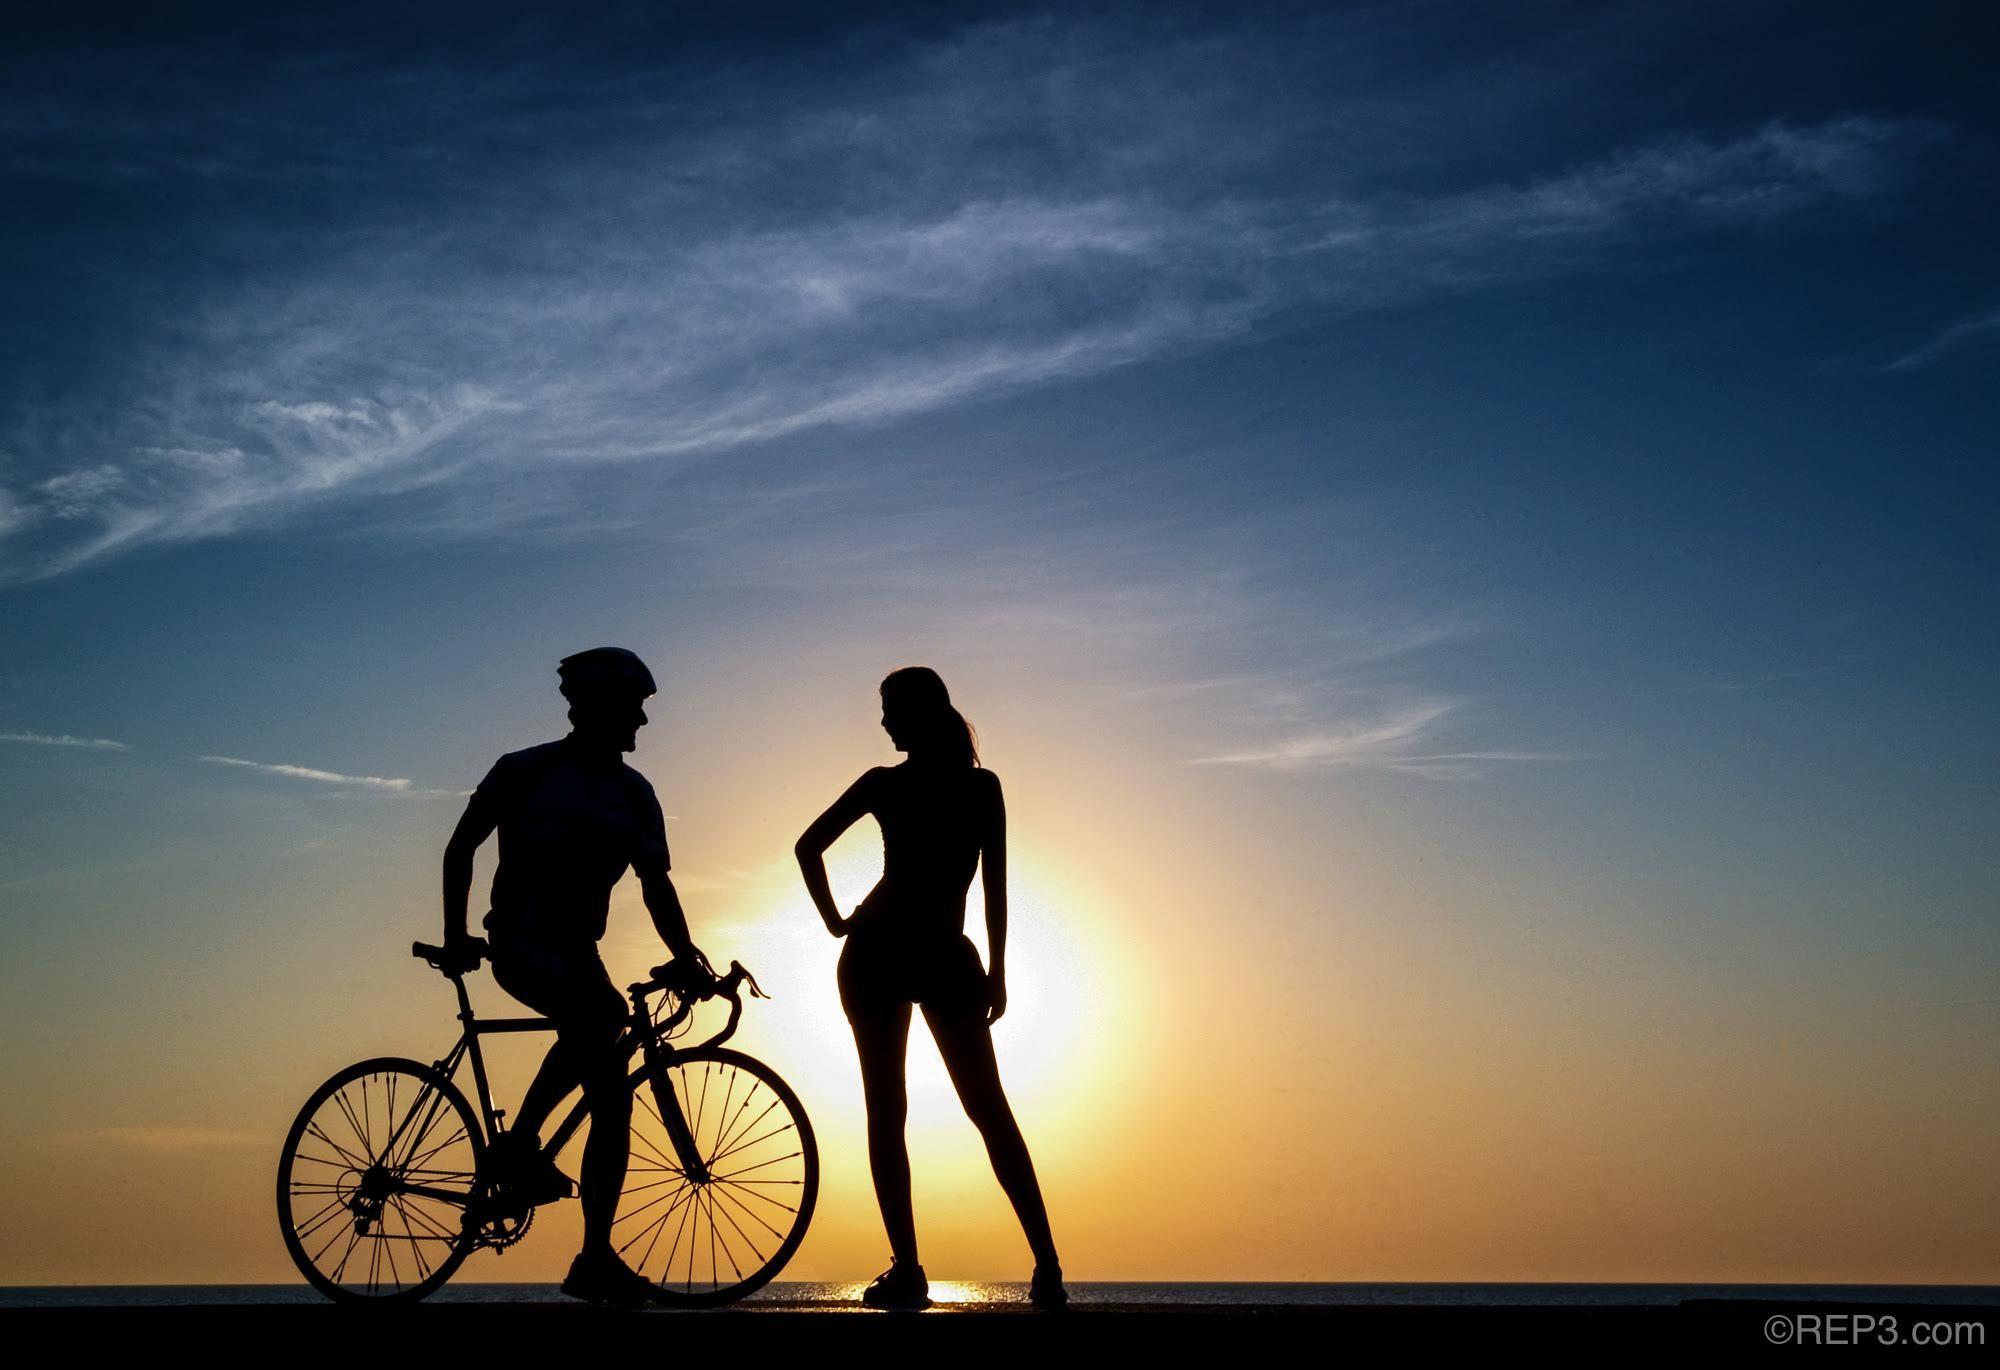 Let's Ride! (ages 40+, fun & fit social riding)